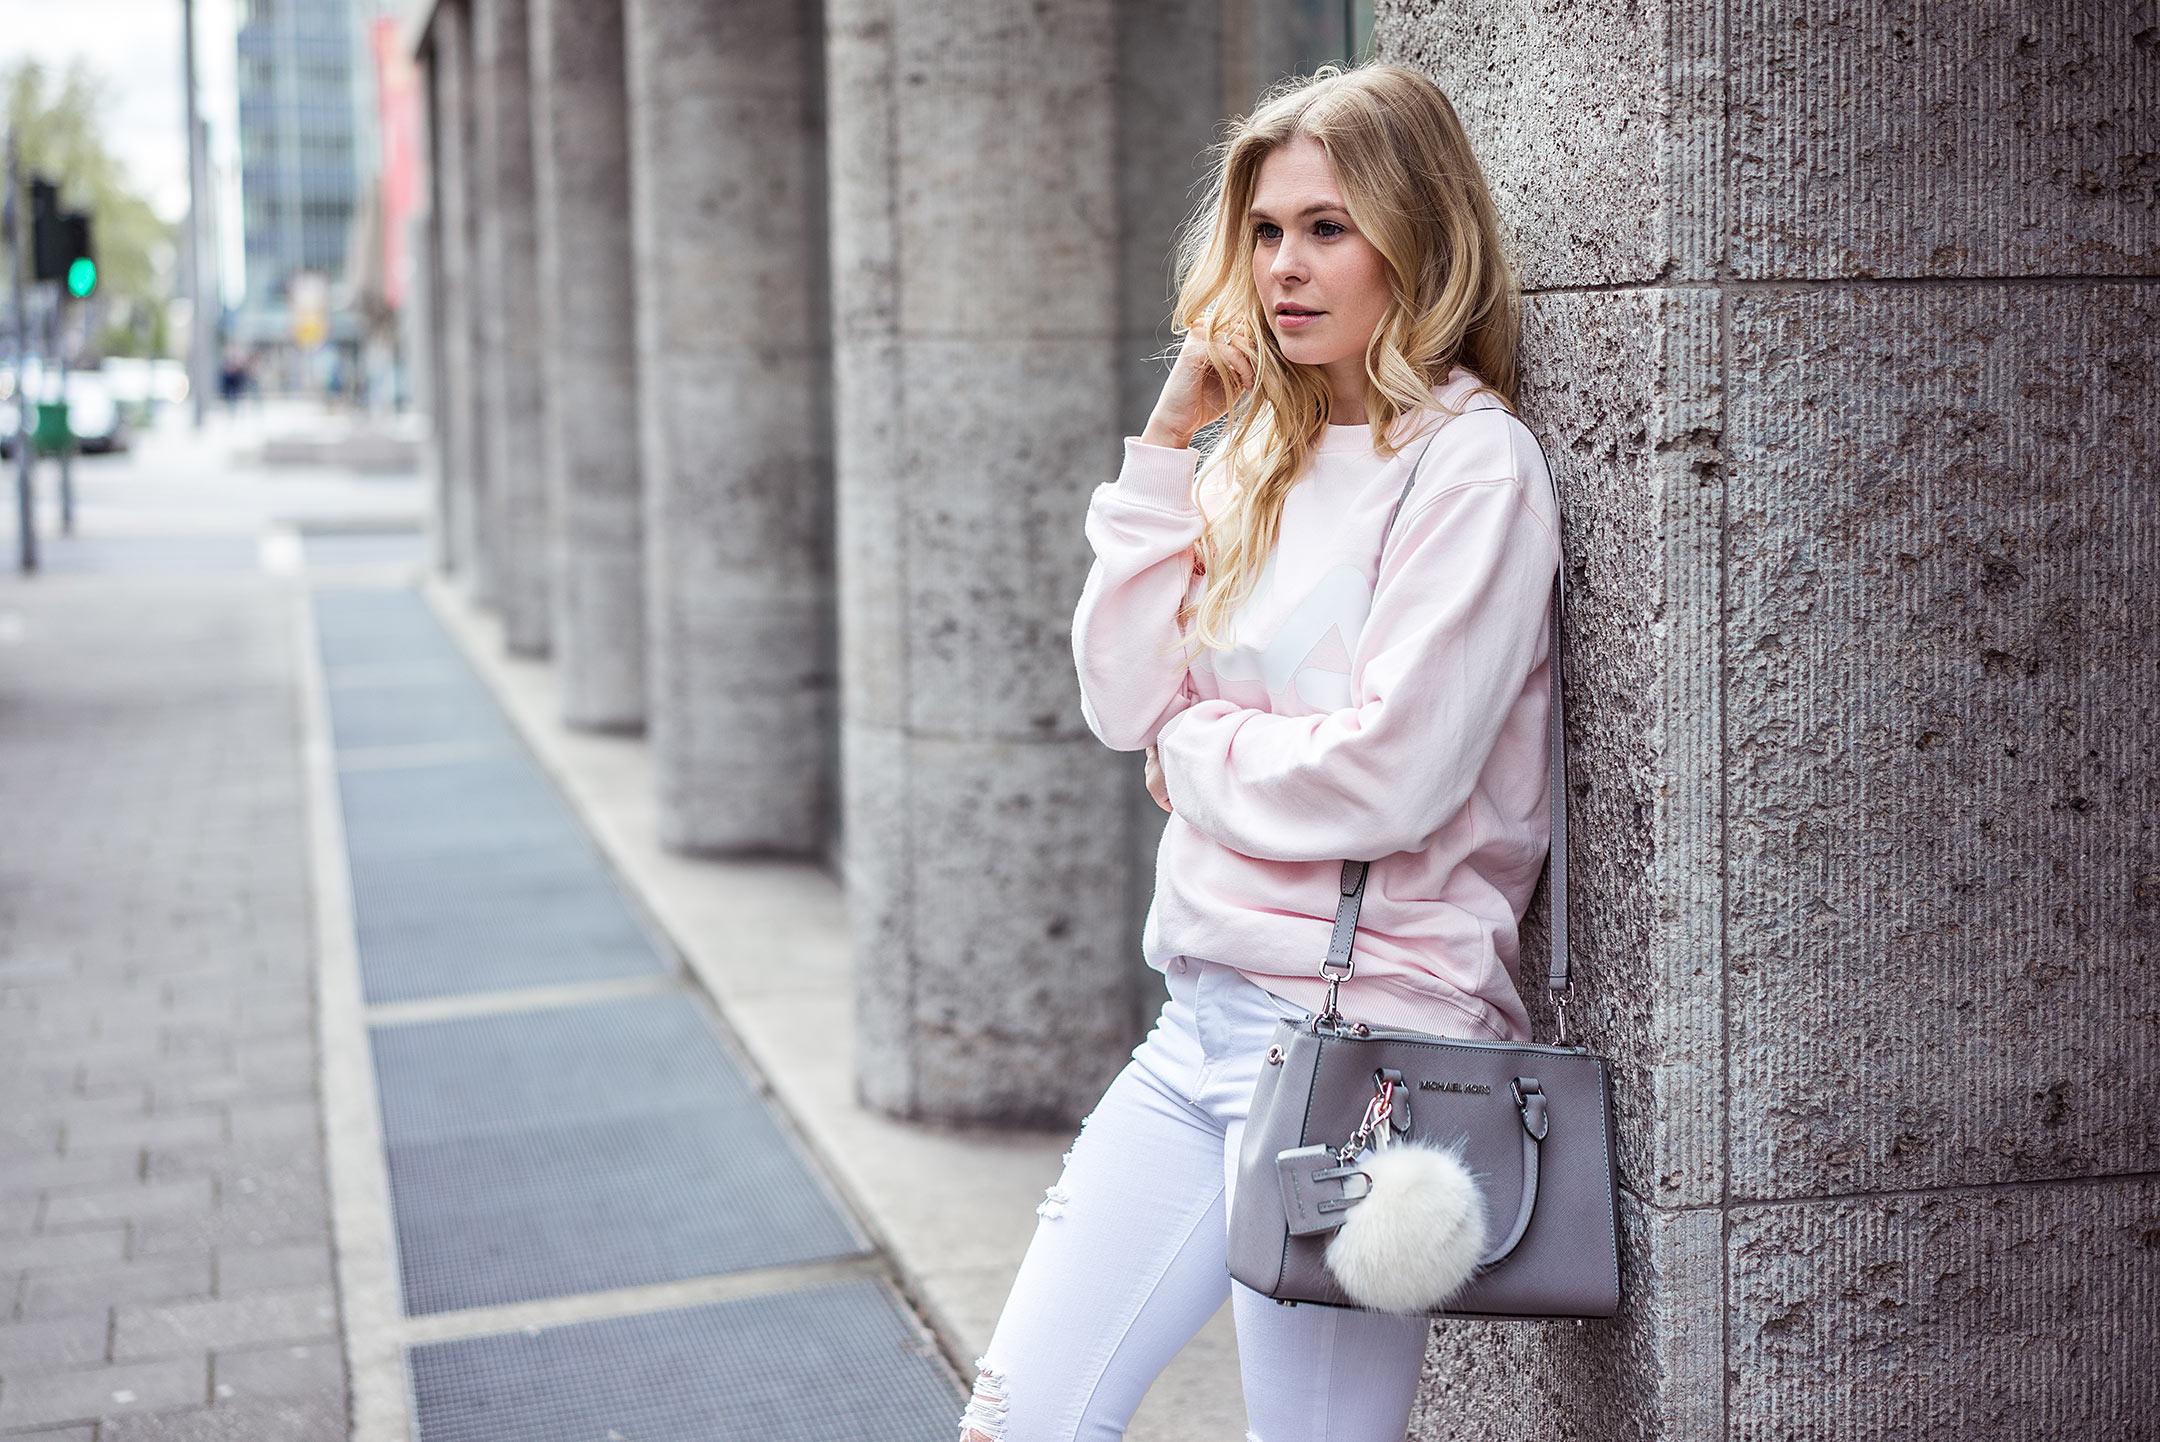 Sunnyinga Rosa Pullover Fila Outfit Springlook Frühlingsoutfit Düsseldorf Fashion Blog